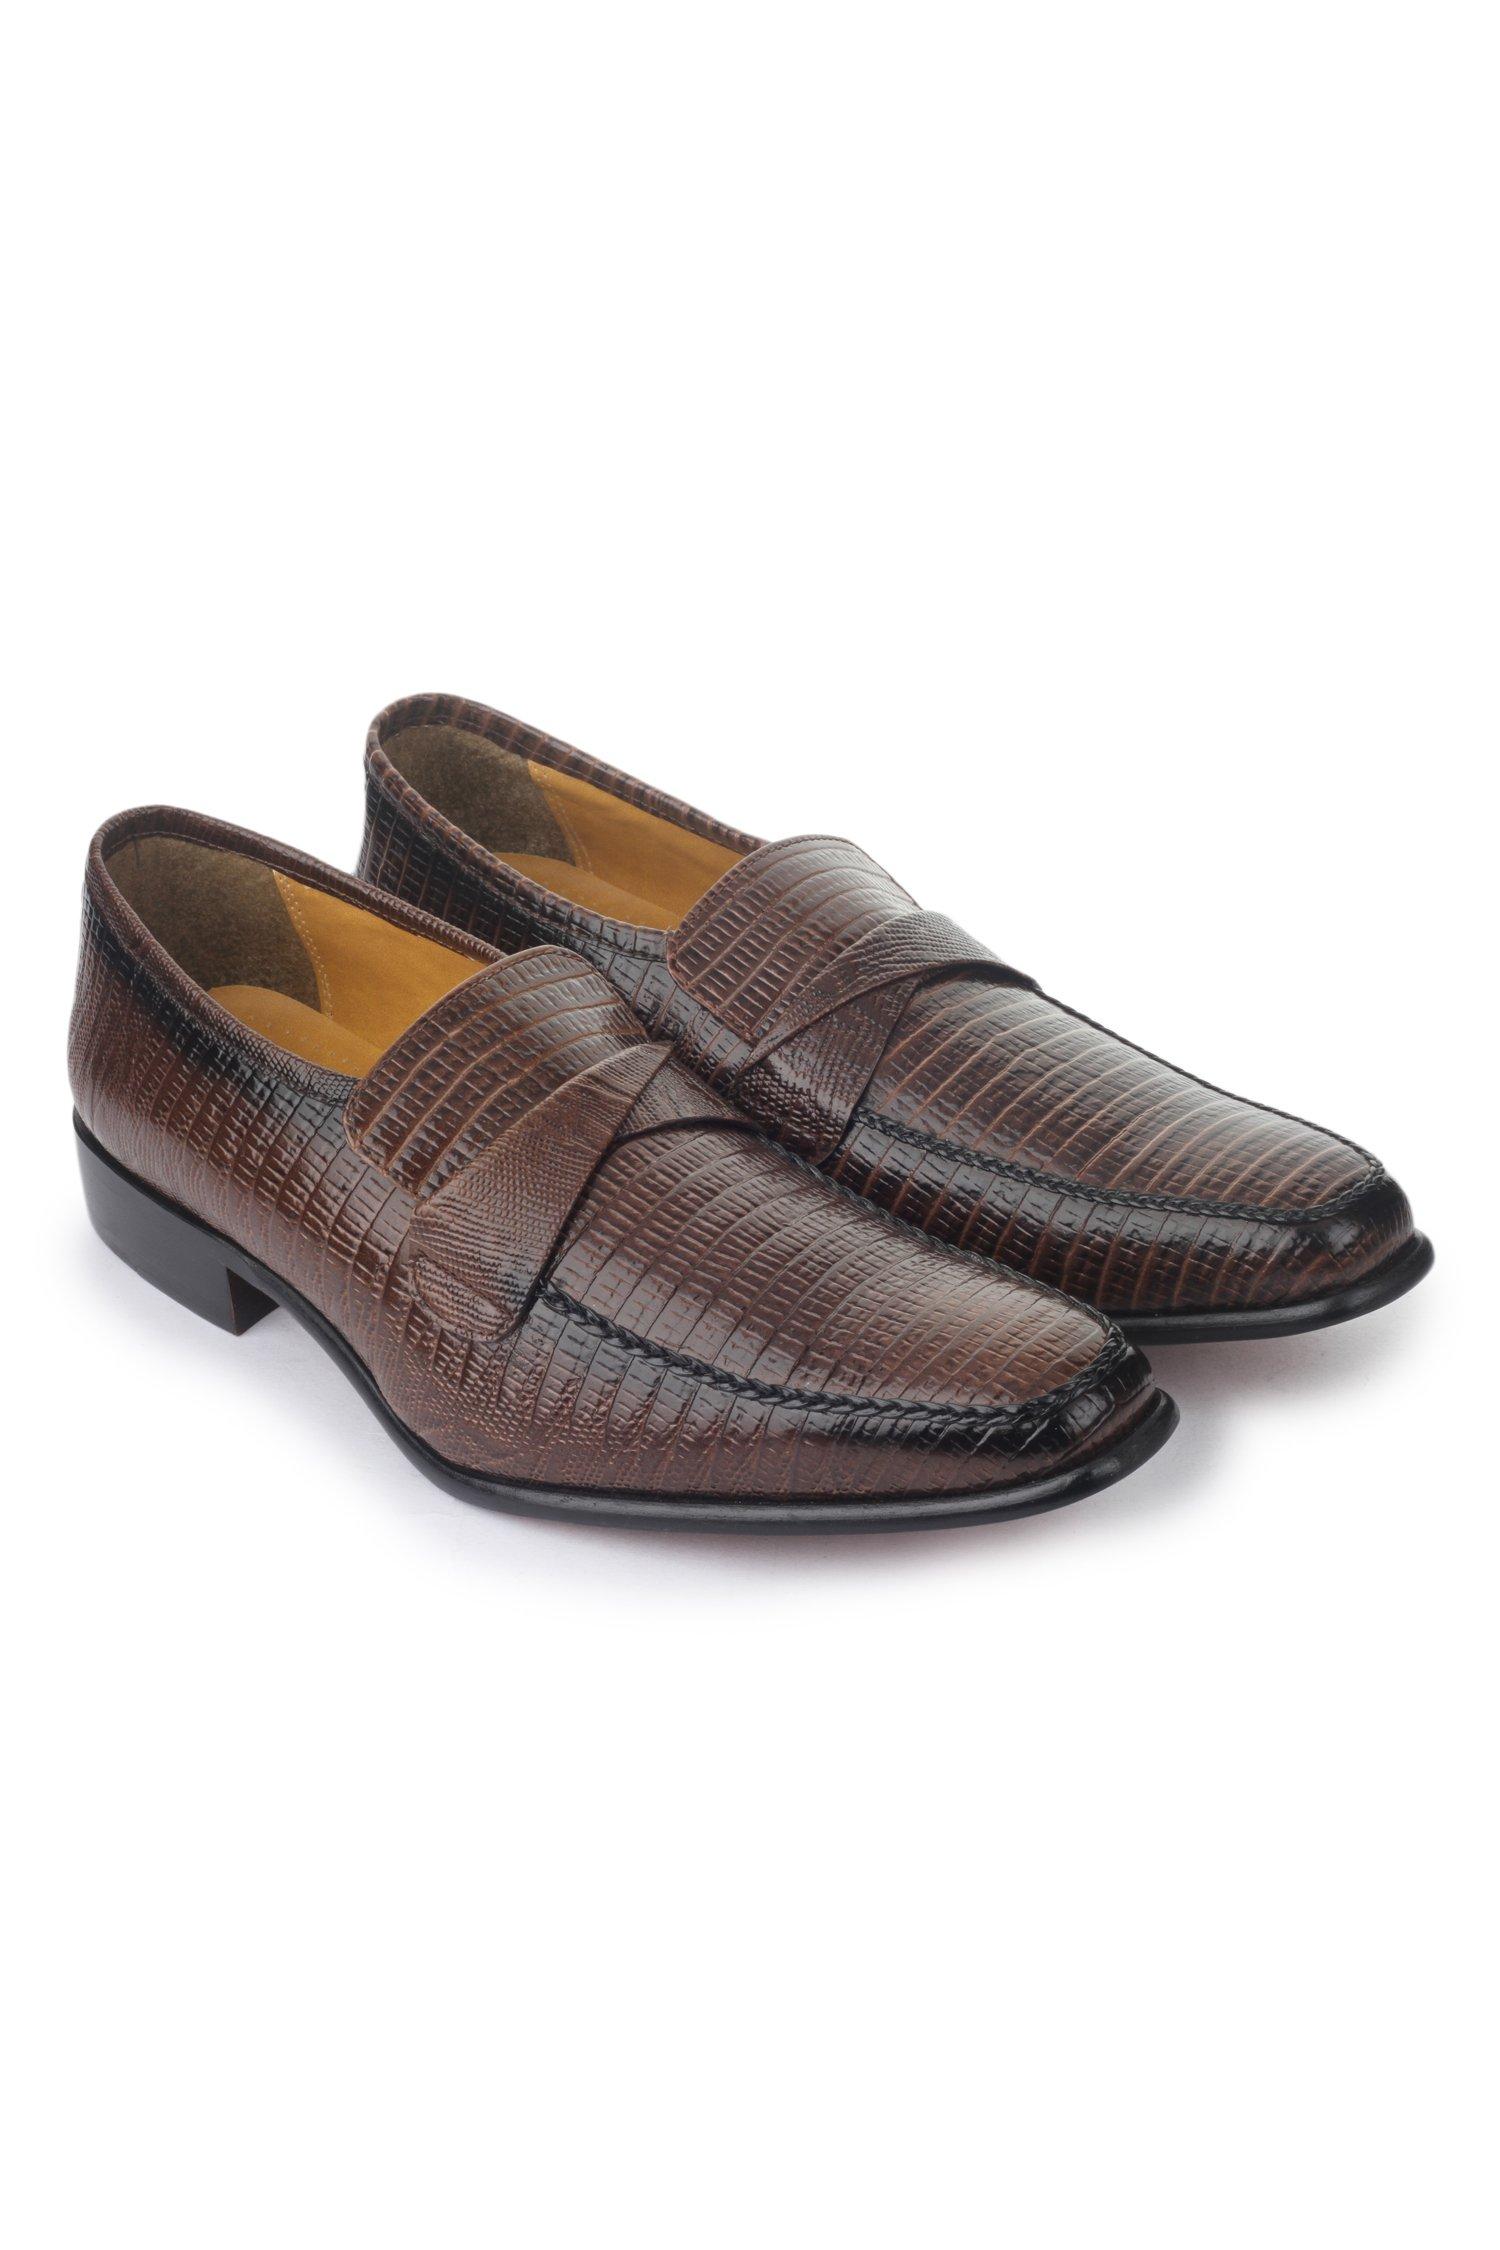 Liberty Mens Exclusive Slip On Shoe Brown 13 D(M) Us 14